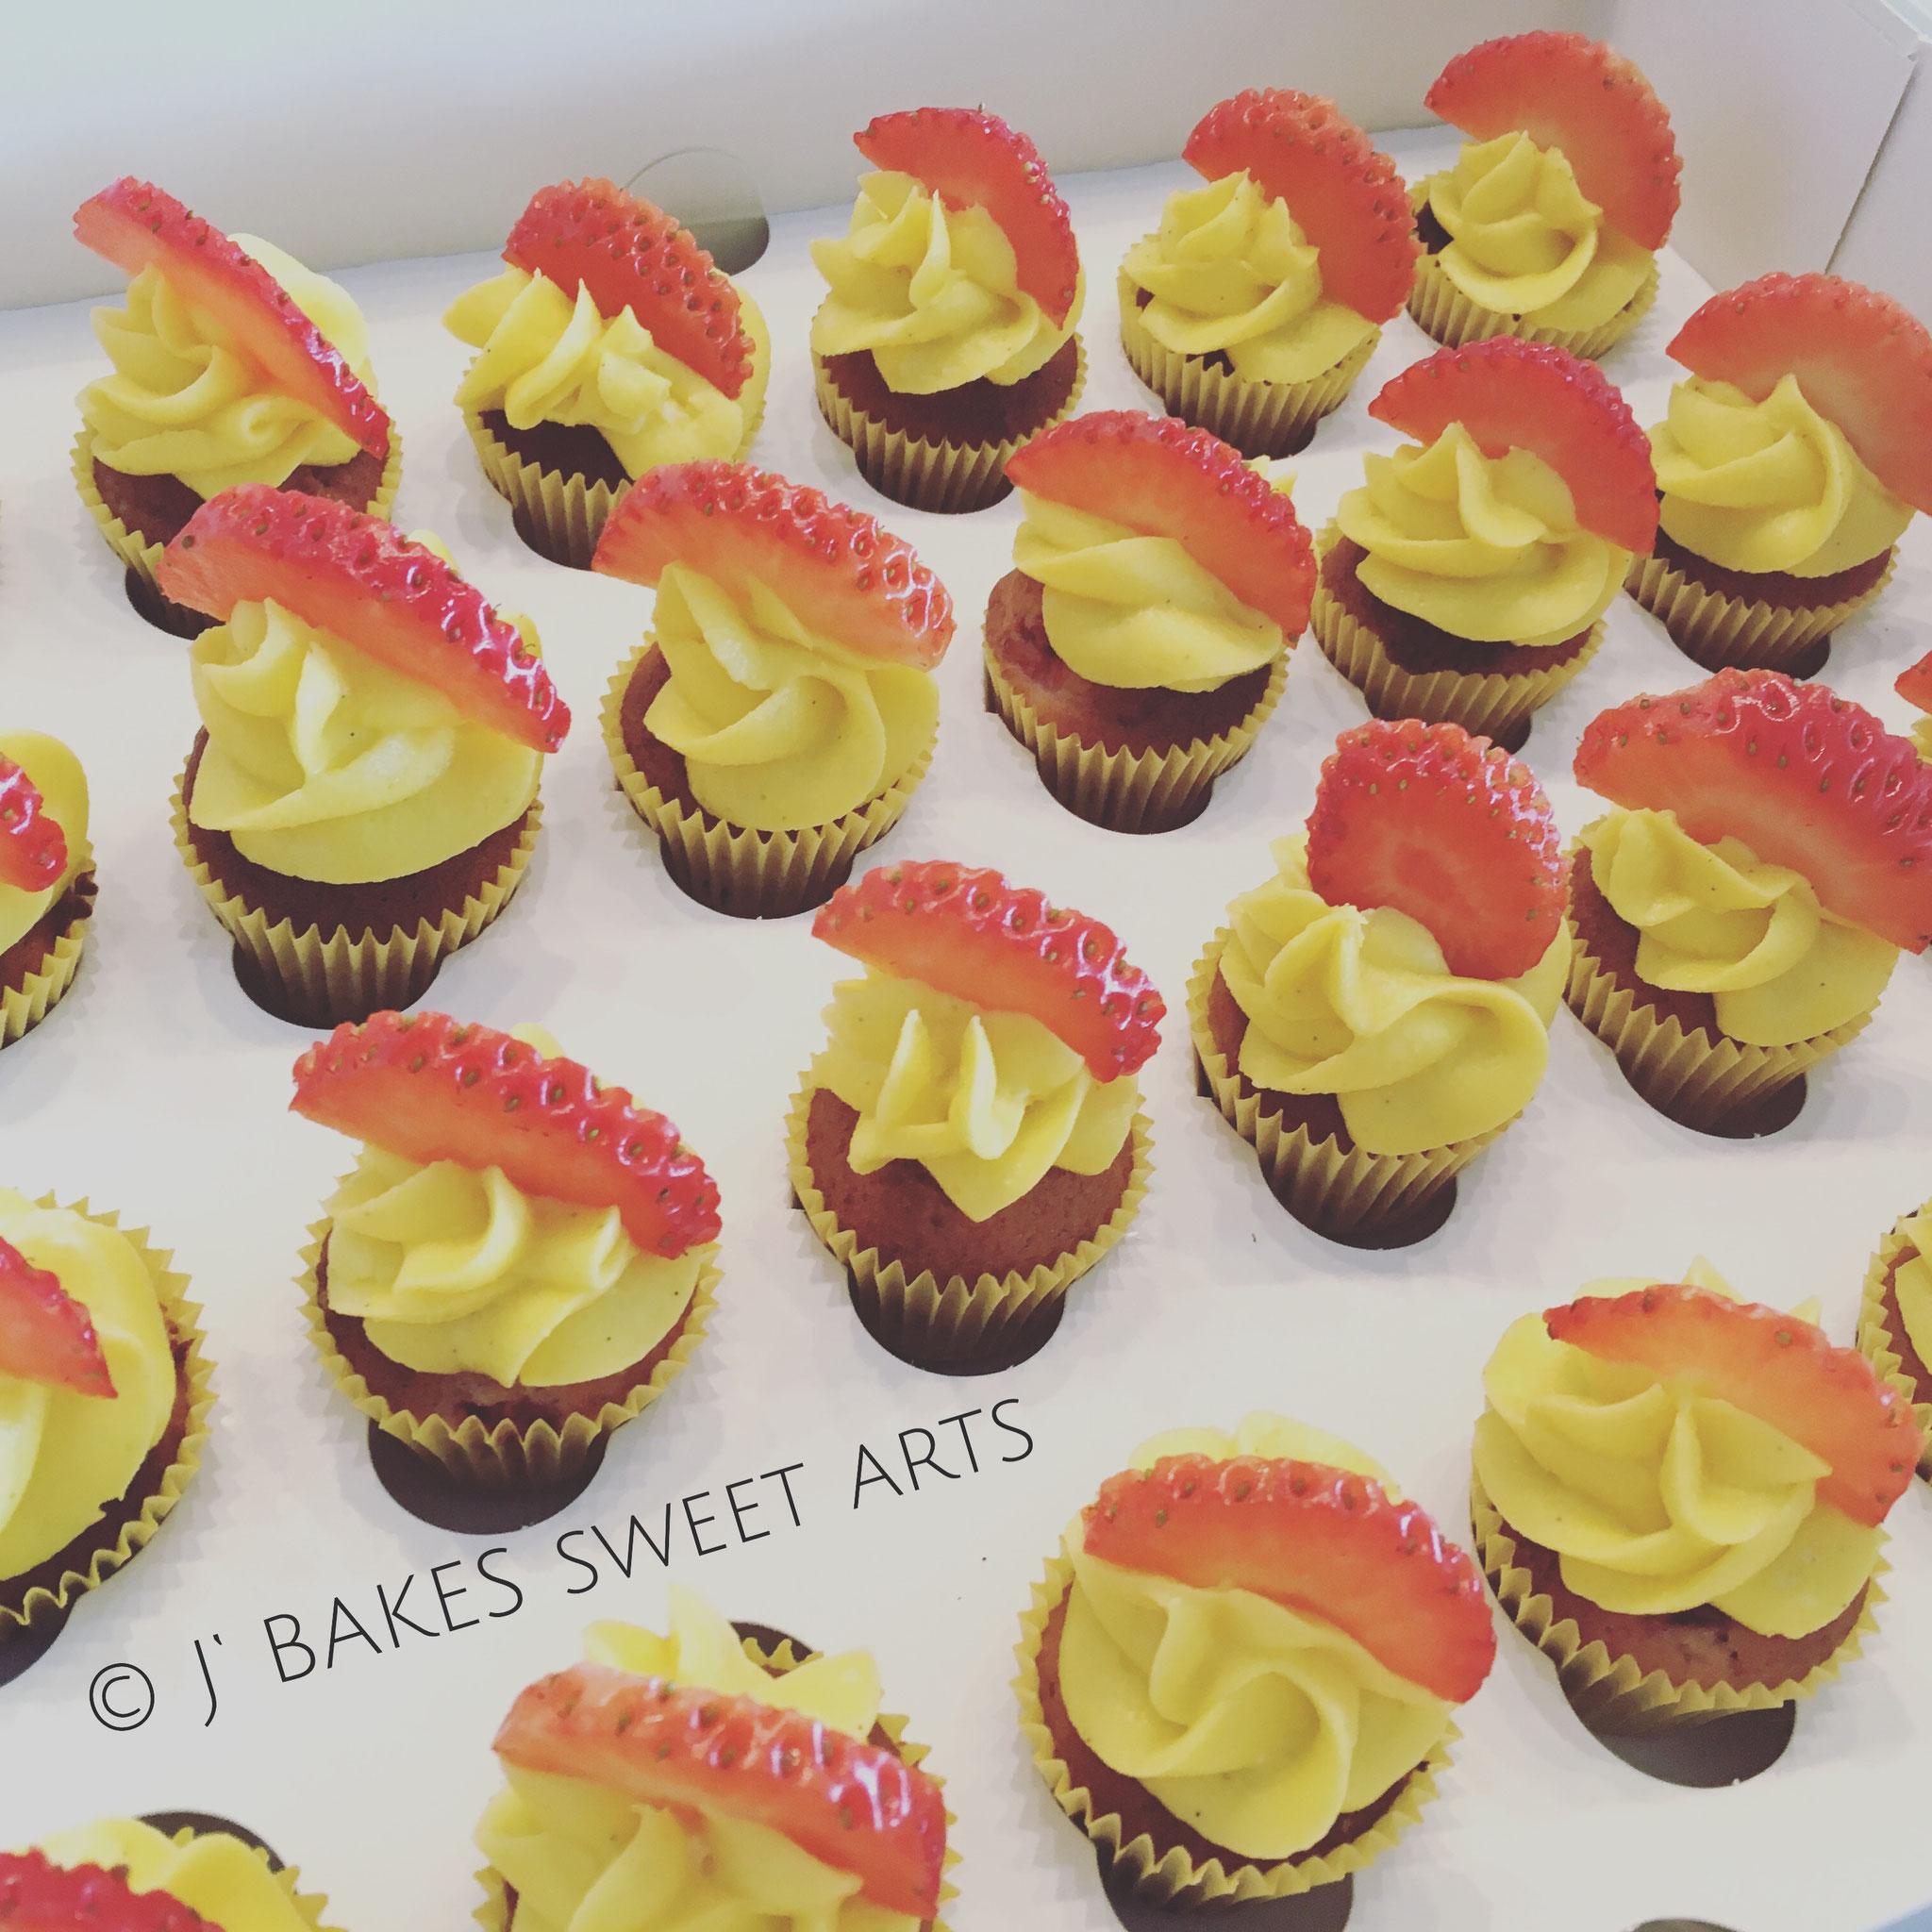 Erdbeer-Mini-Cupcakes // Strawberry-Mini-Cupcakes